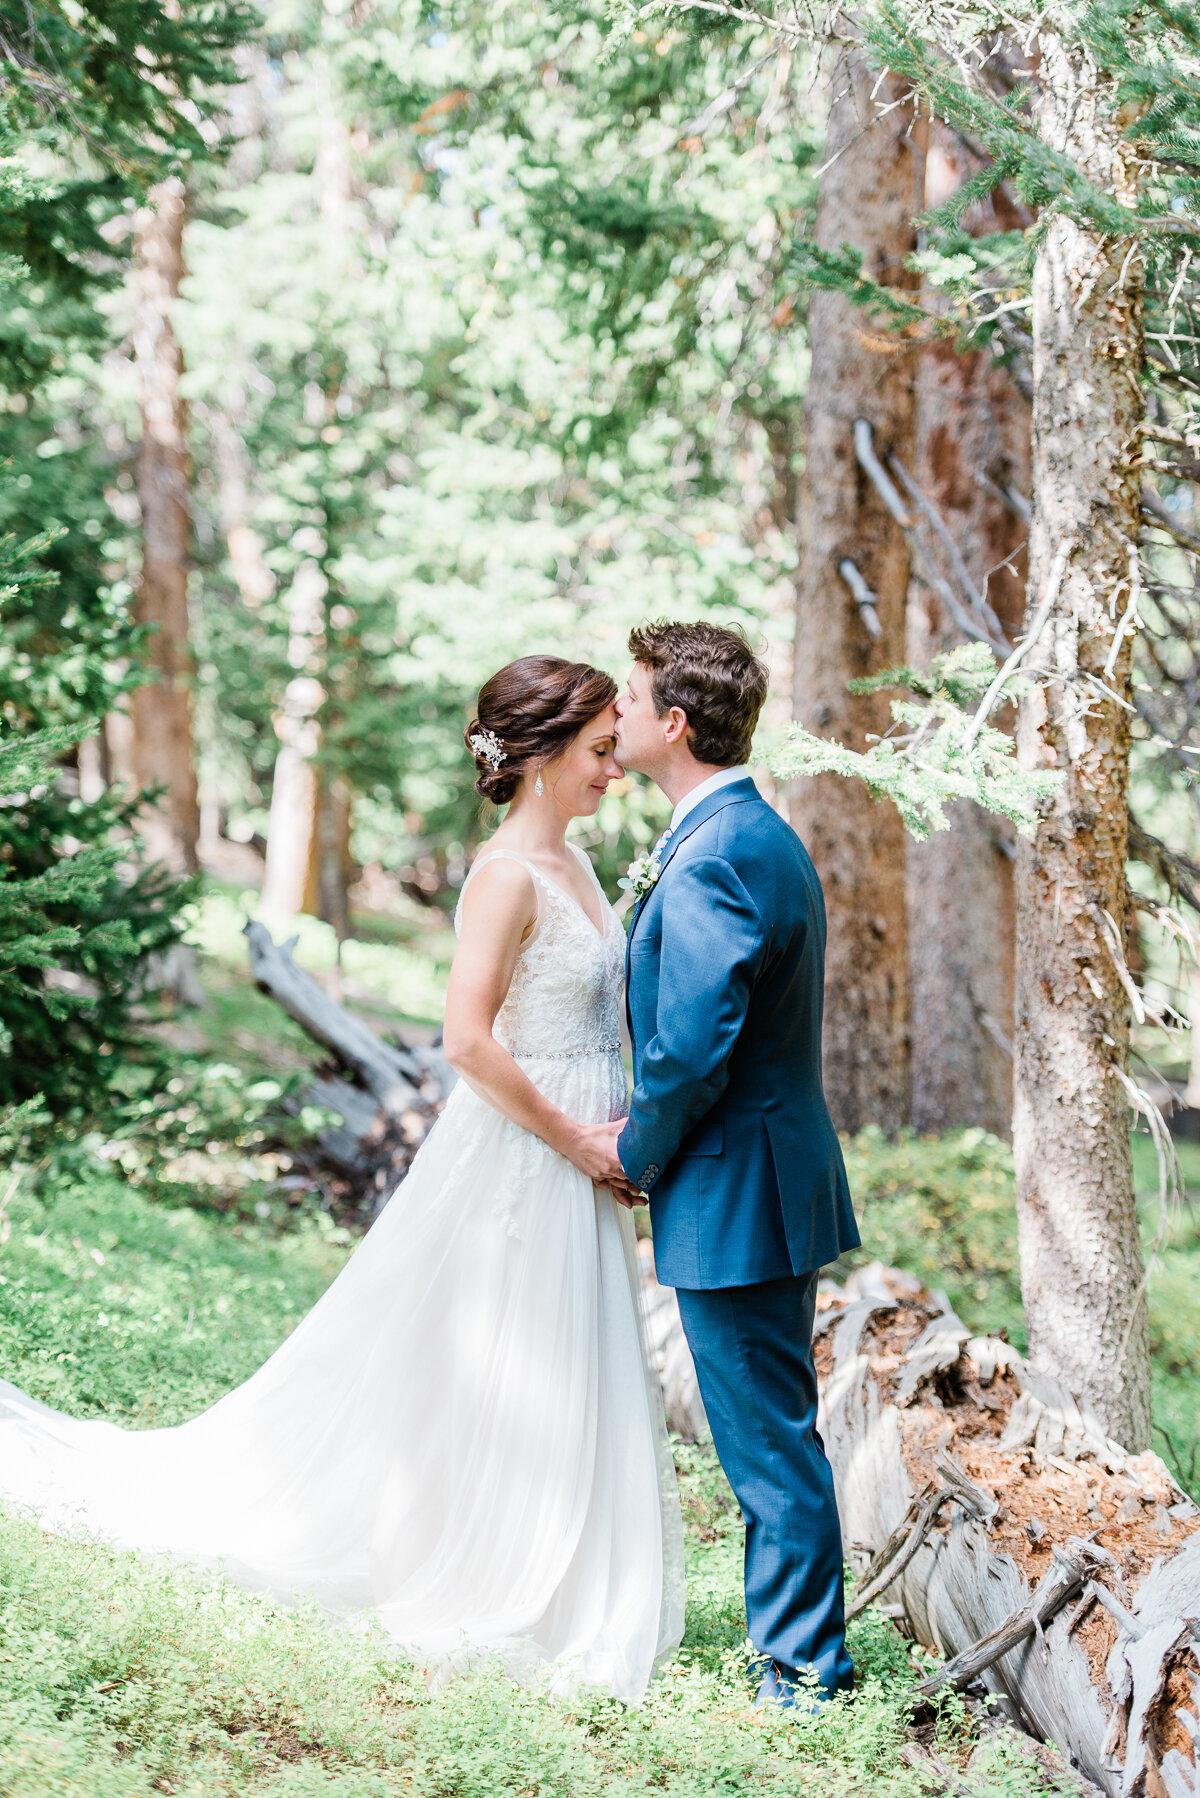 AshleighMillerPhotography-Wedding-Natalia-Matt-ArapahoeBasin-Colorado-17.jpg